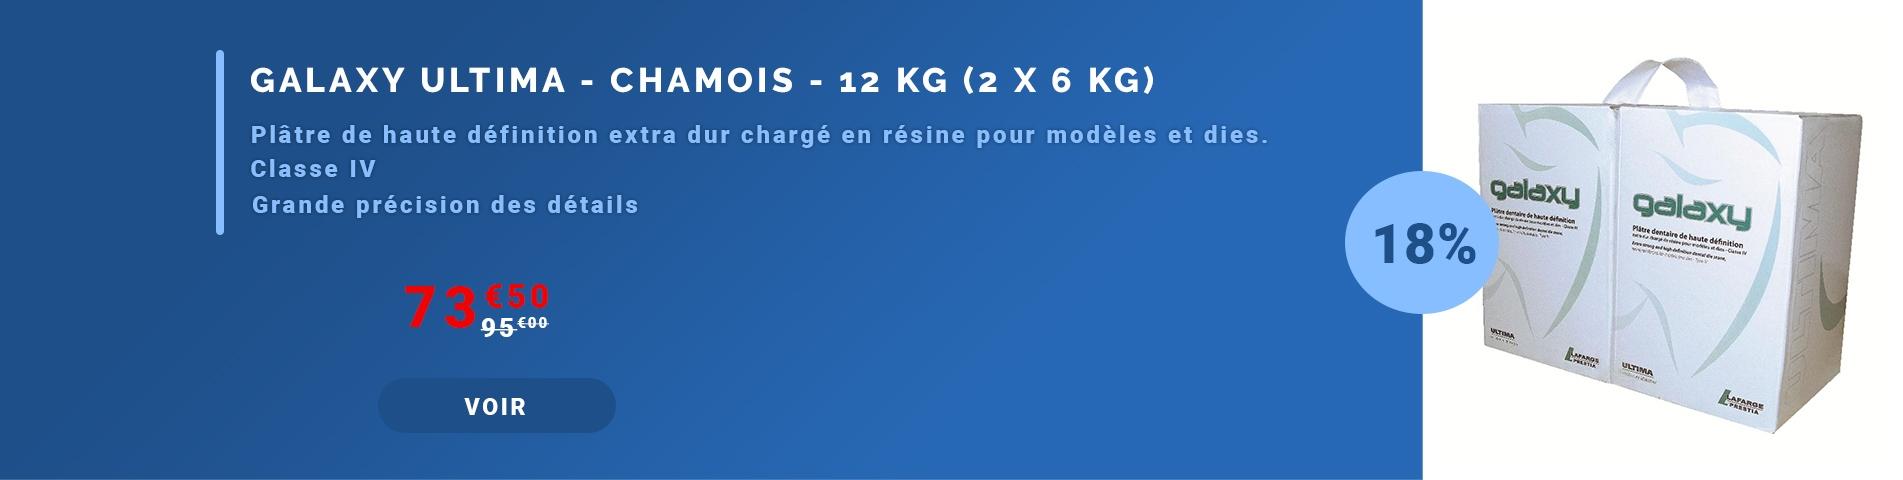 Galaxy ULTIMA - Chamois - 12 Kg (2 X 6 Kg)